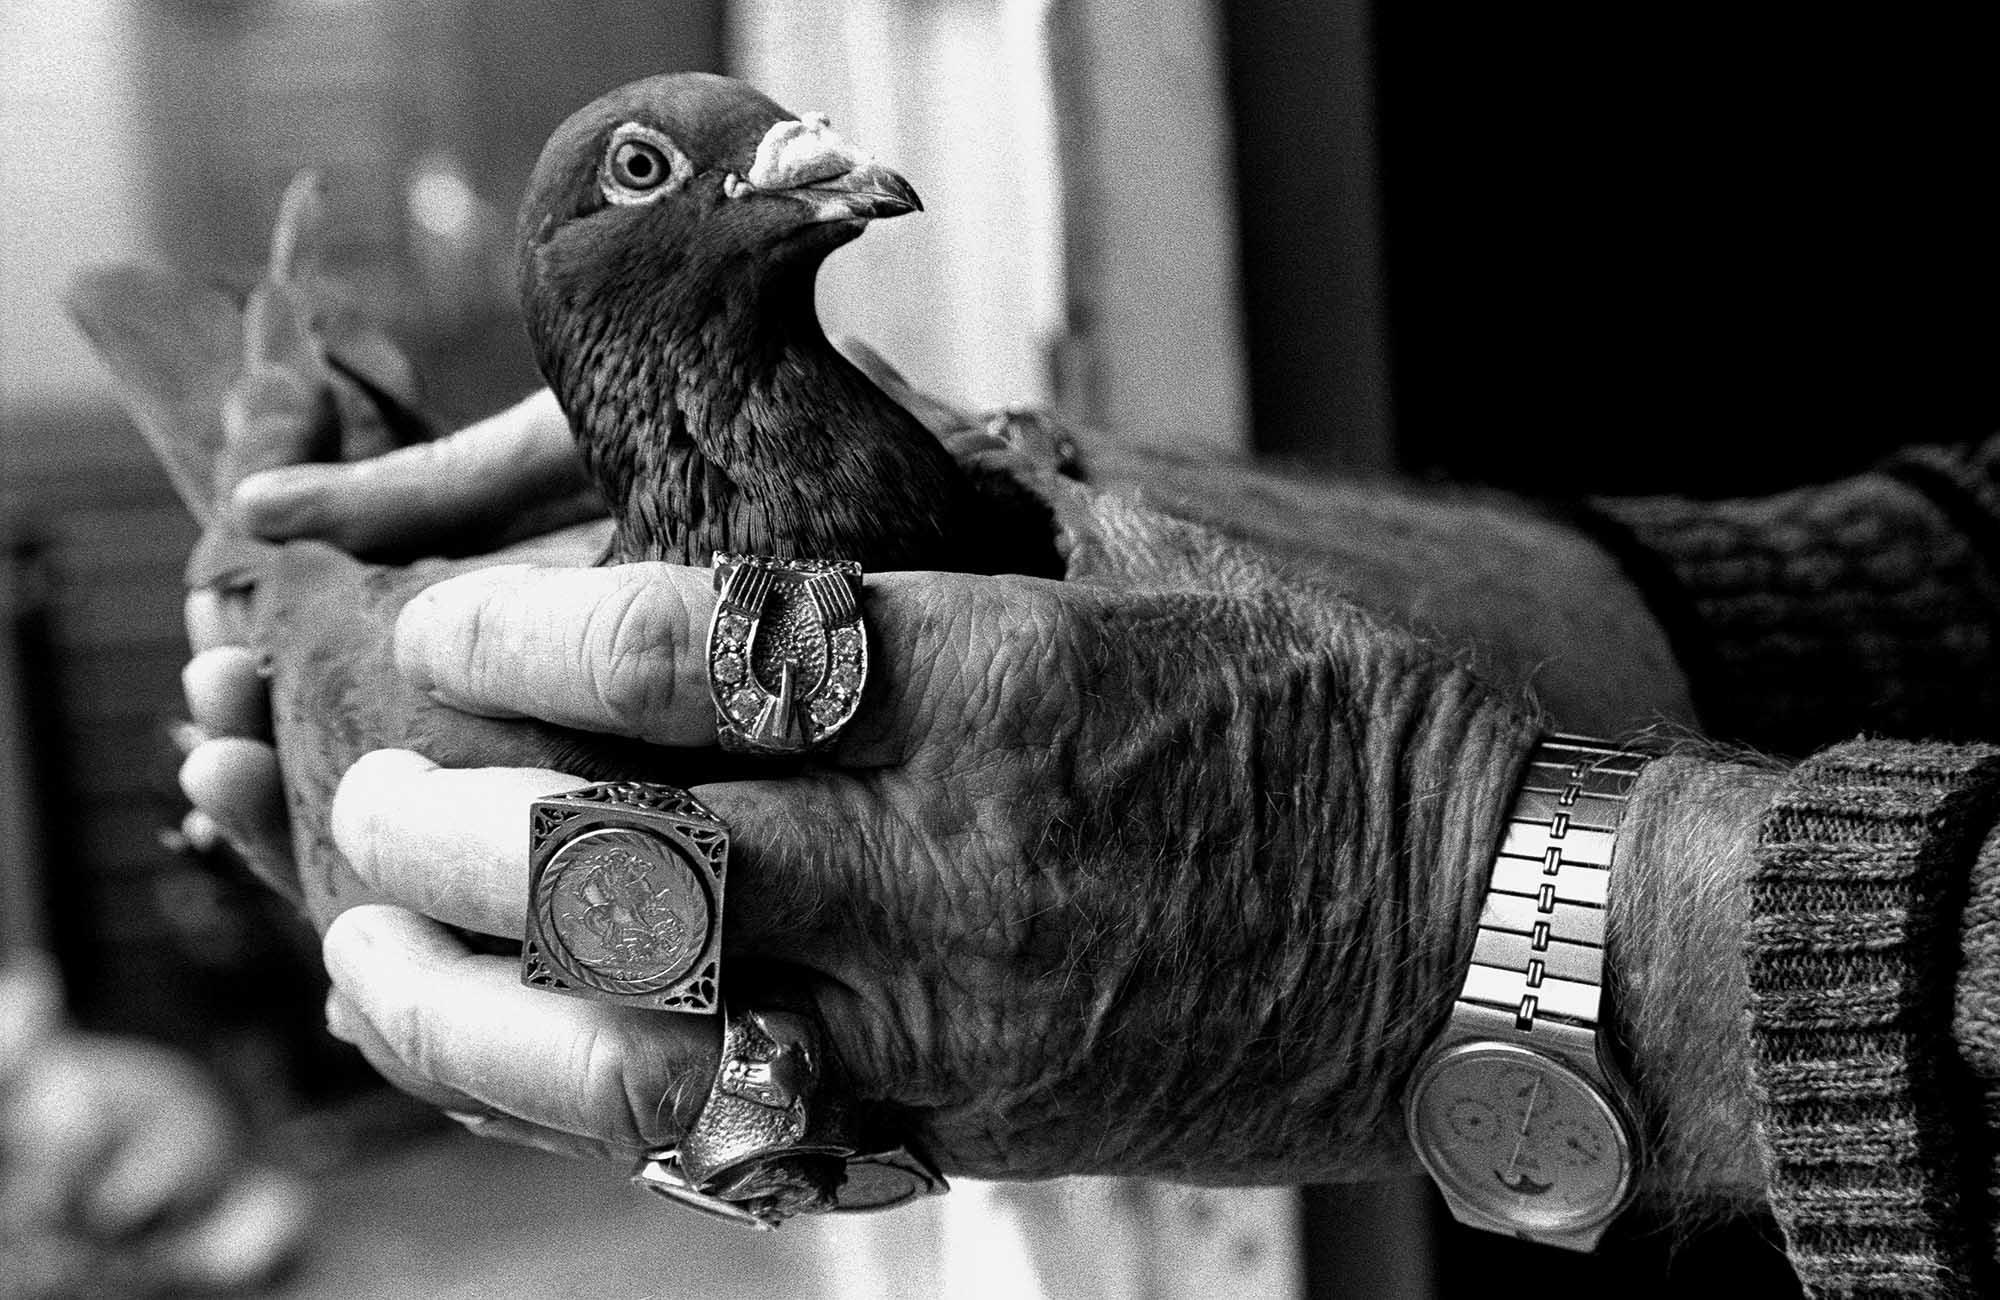 Zak Waters | documentary photographer | personal wor